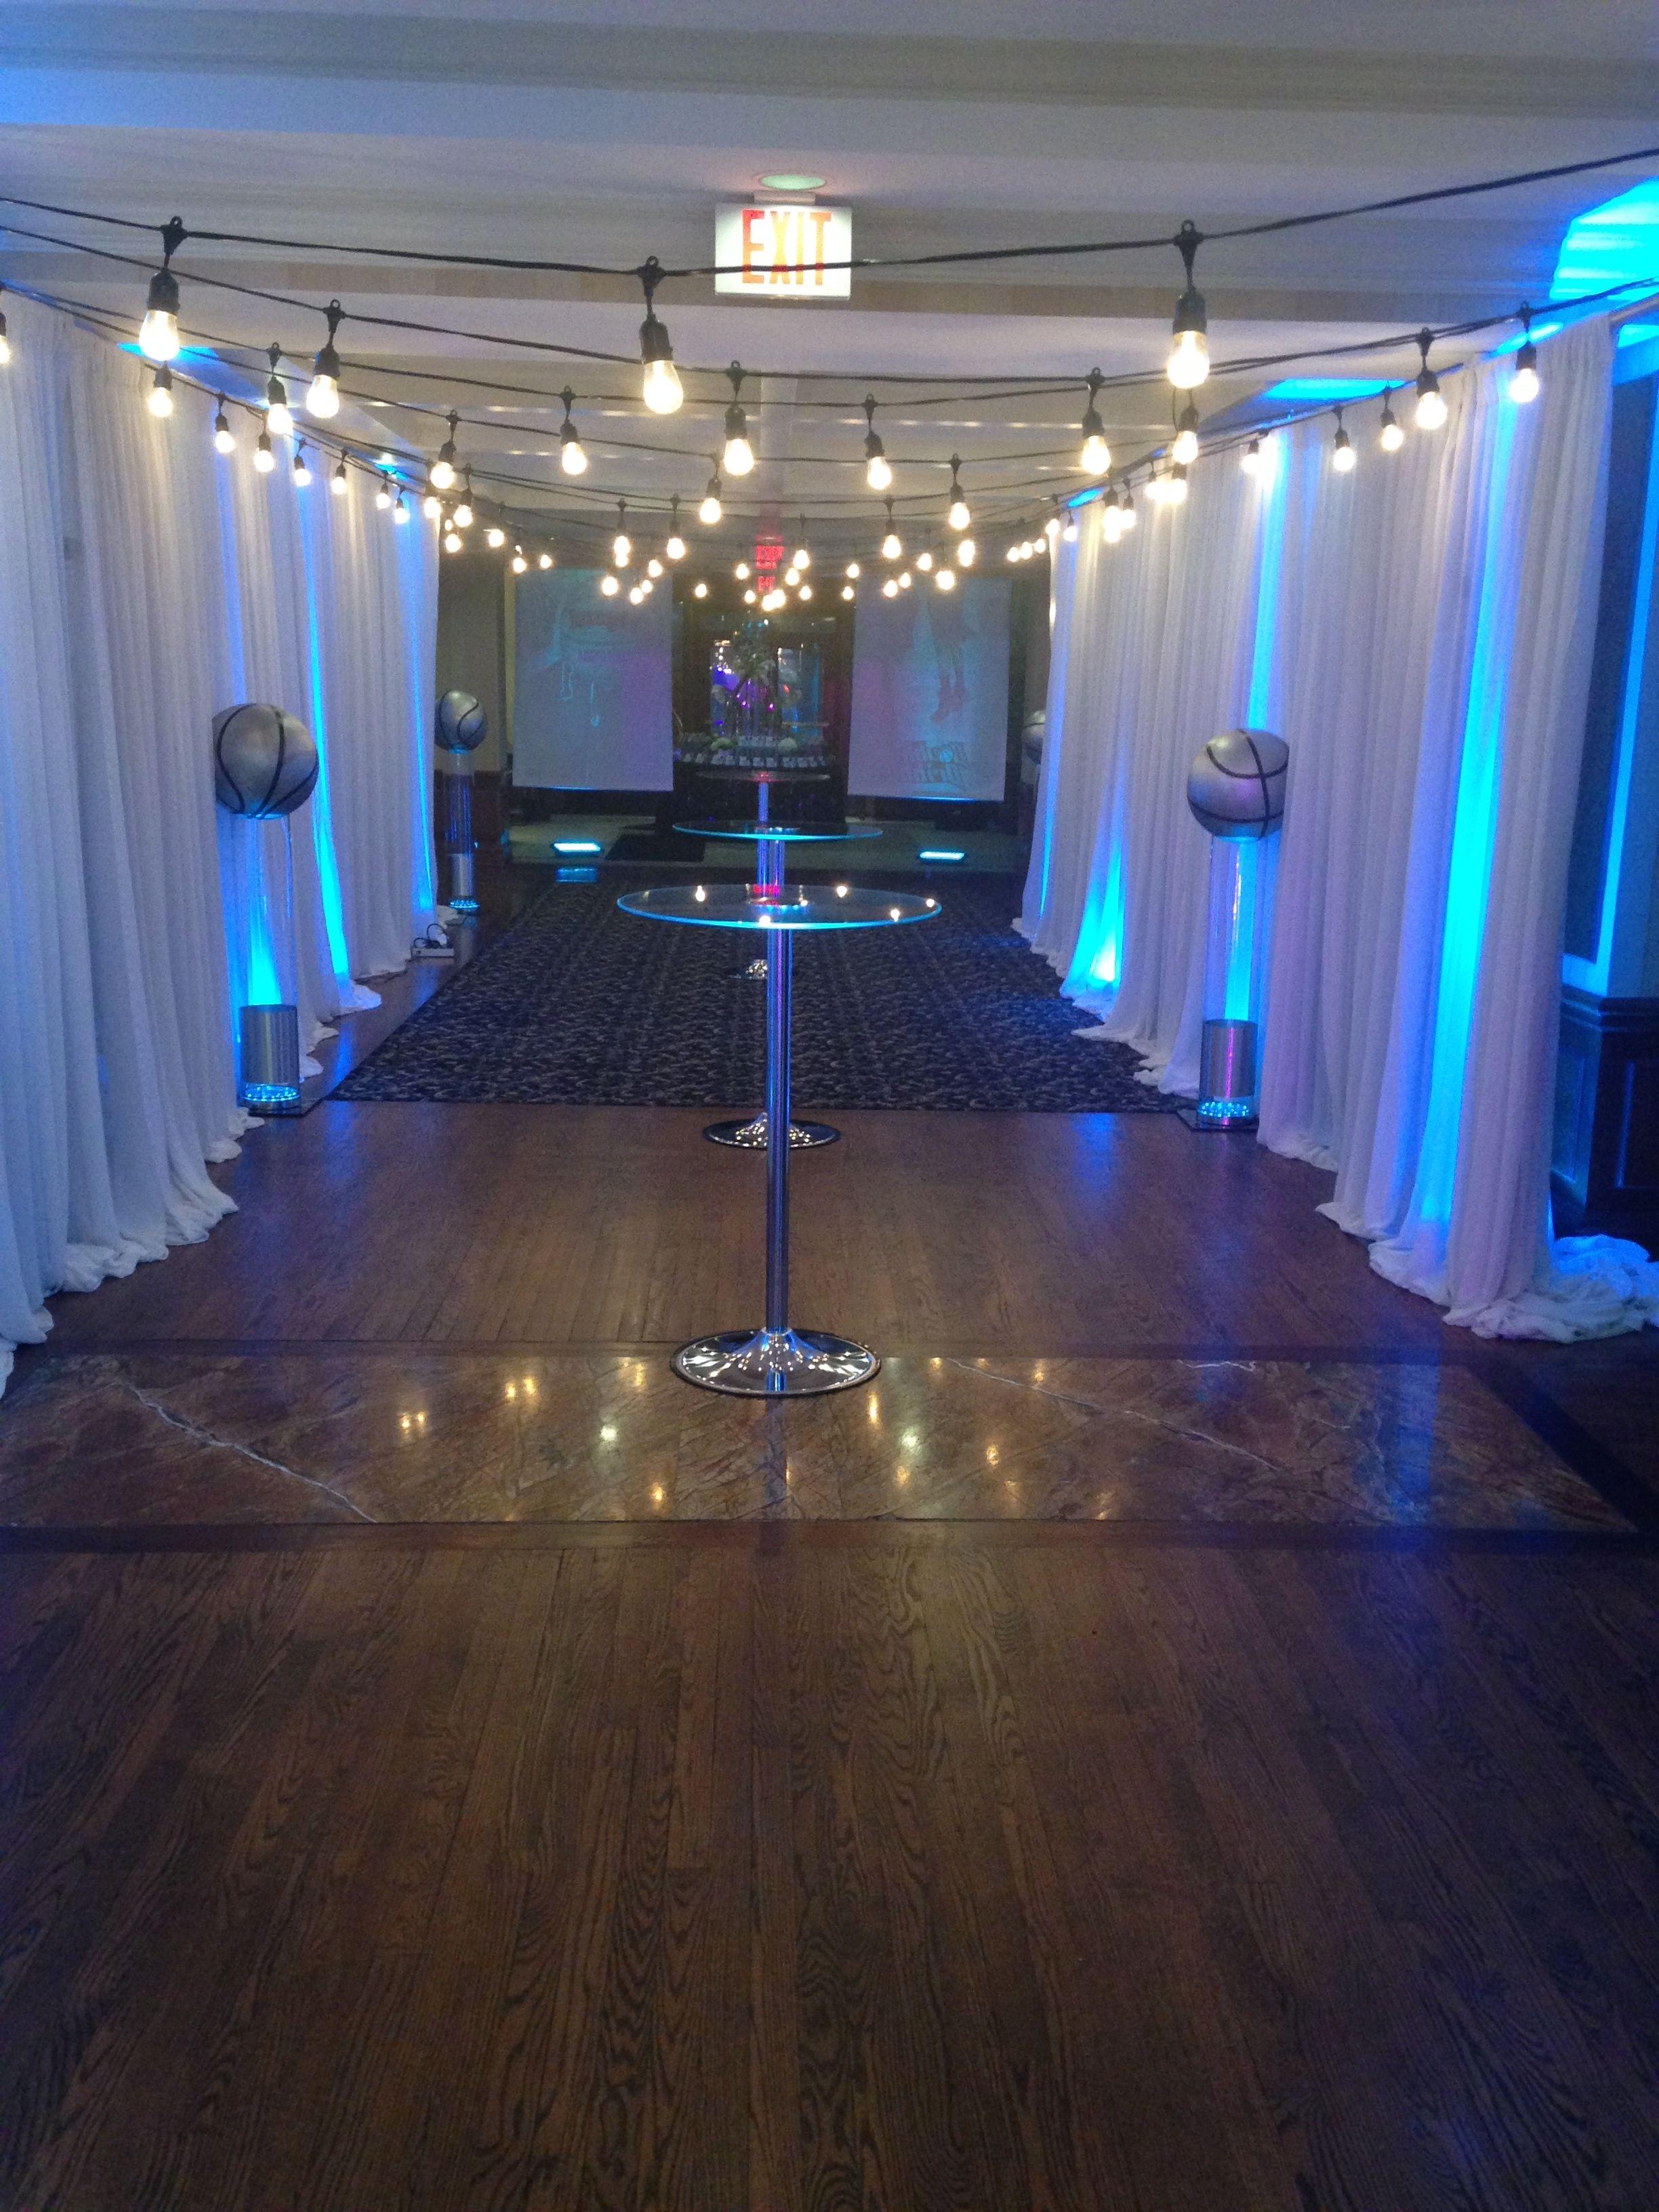 Www Pegasusentertainment Mitzvah Lelights Drape Uplights Entrancehallway